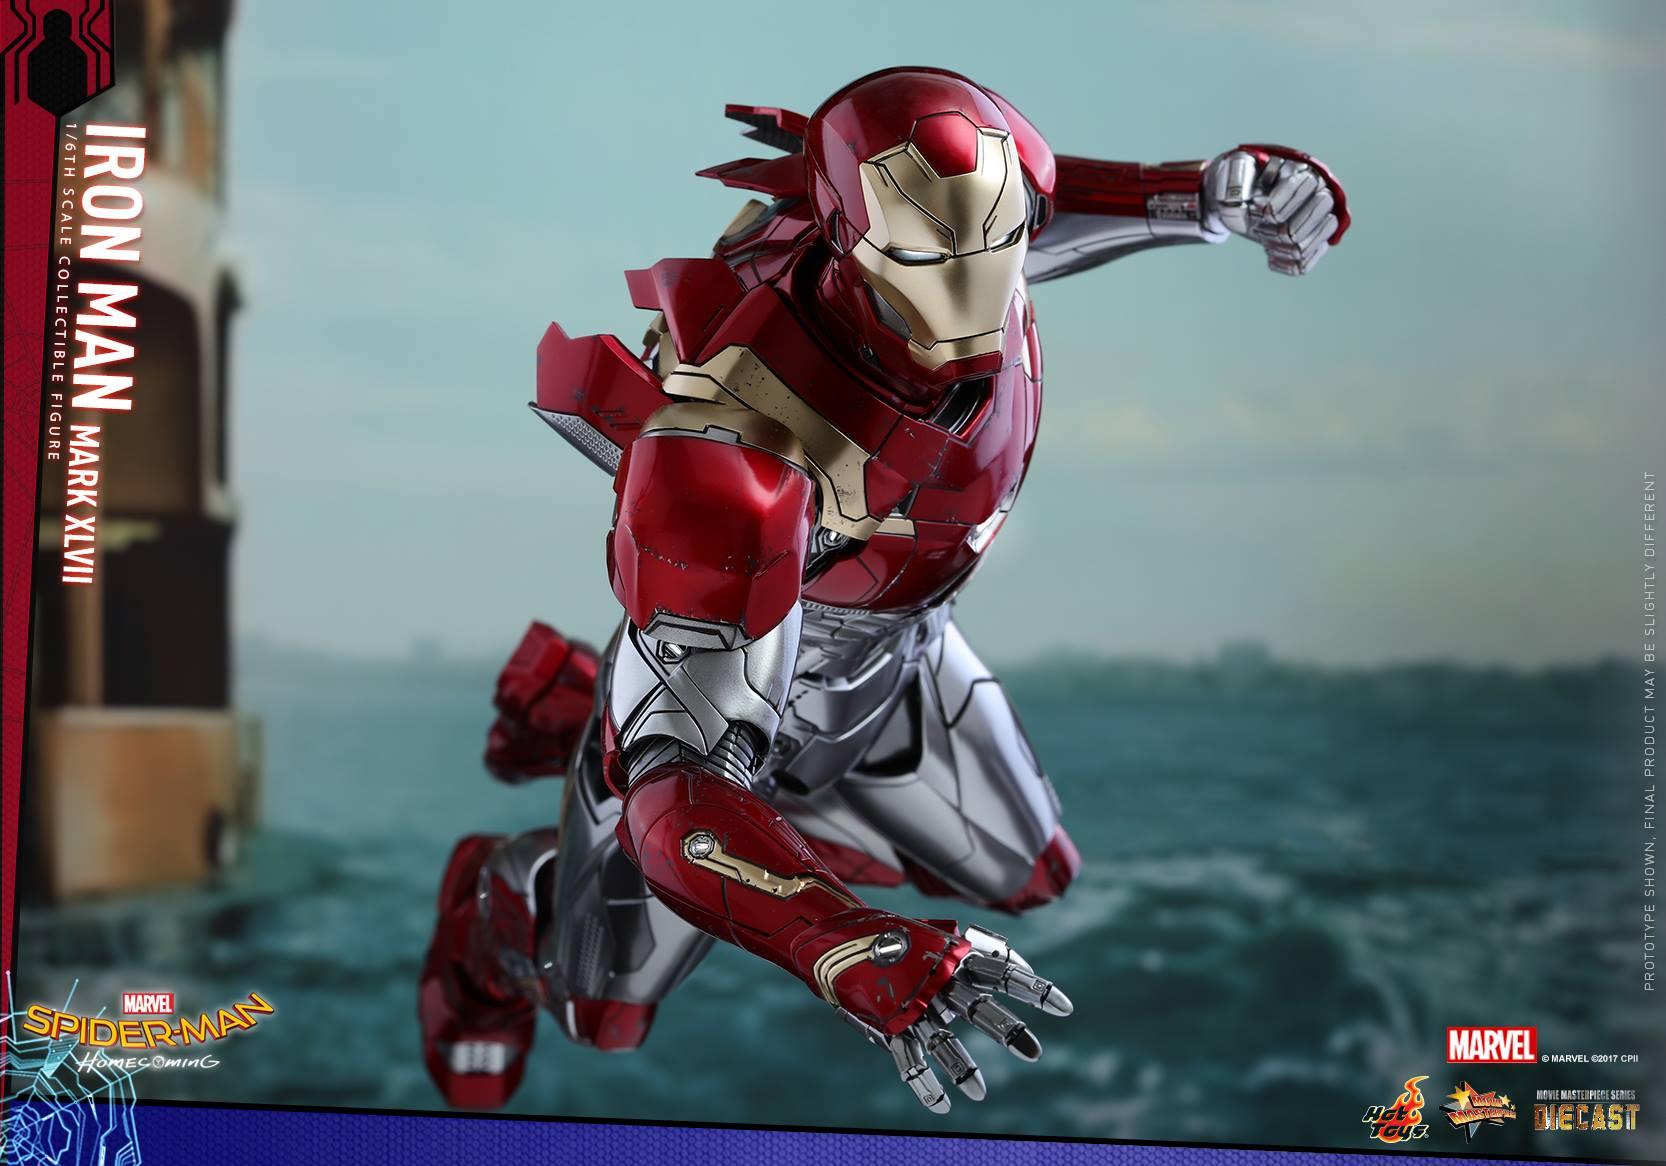 Hot Toys Spider-Man Homecoming Iron Man